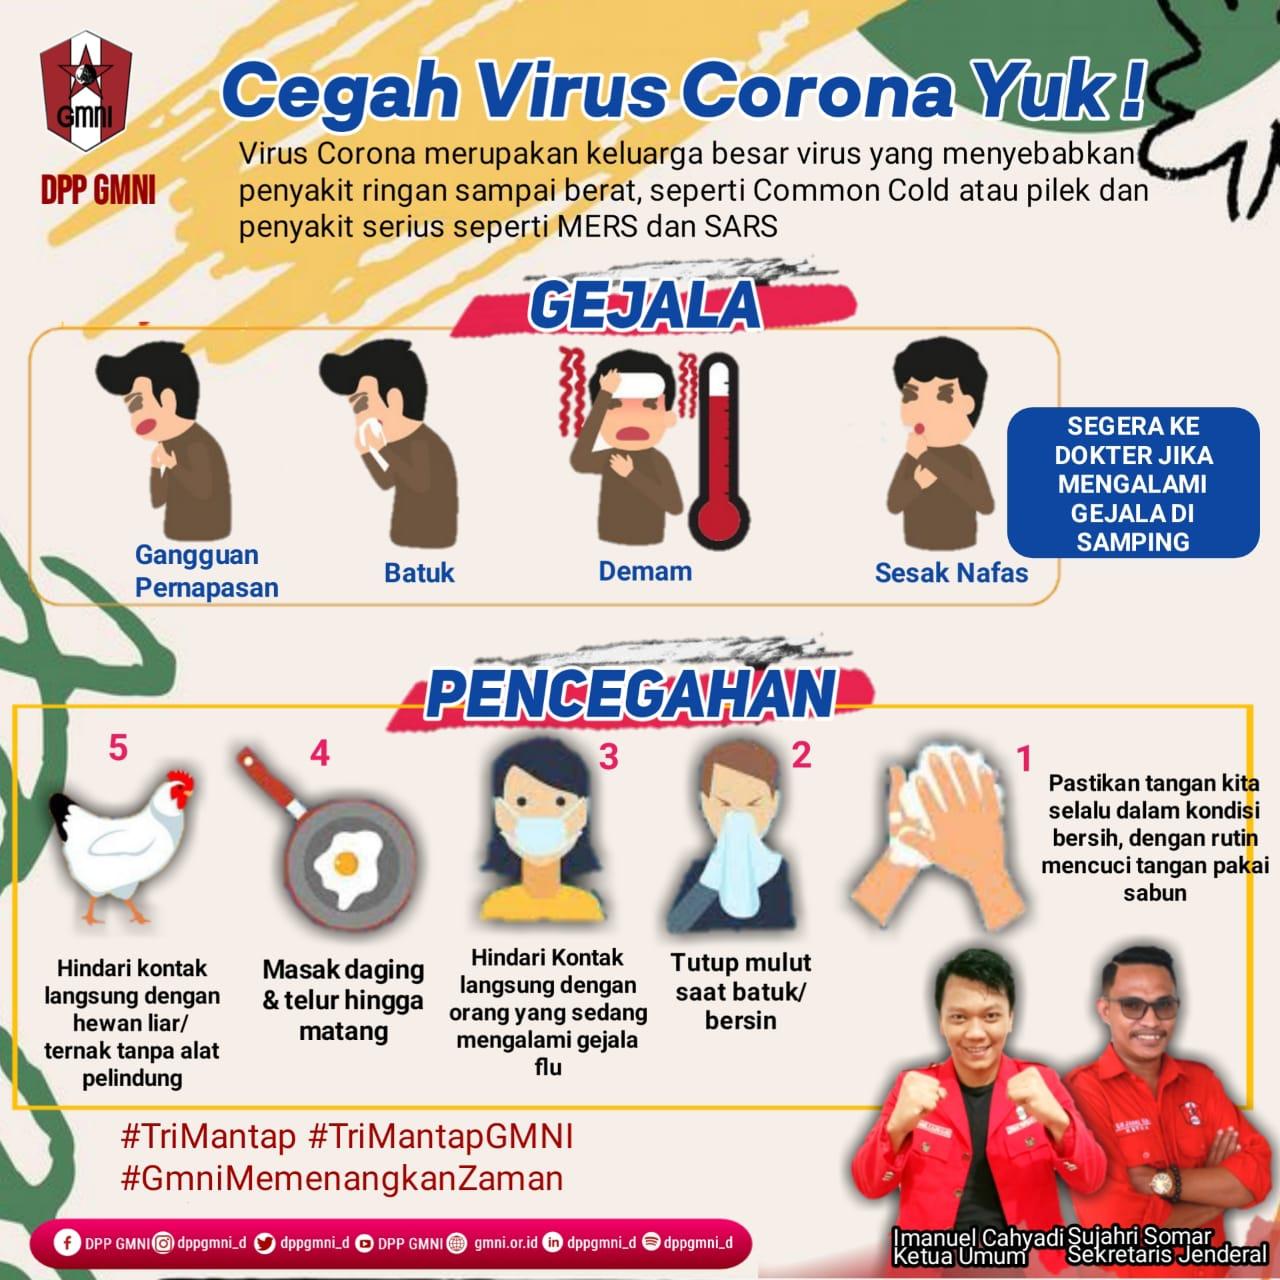 Cegah Virus Corona Yuk !